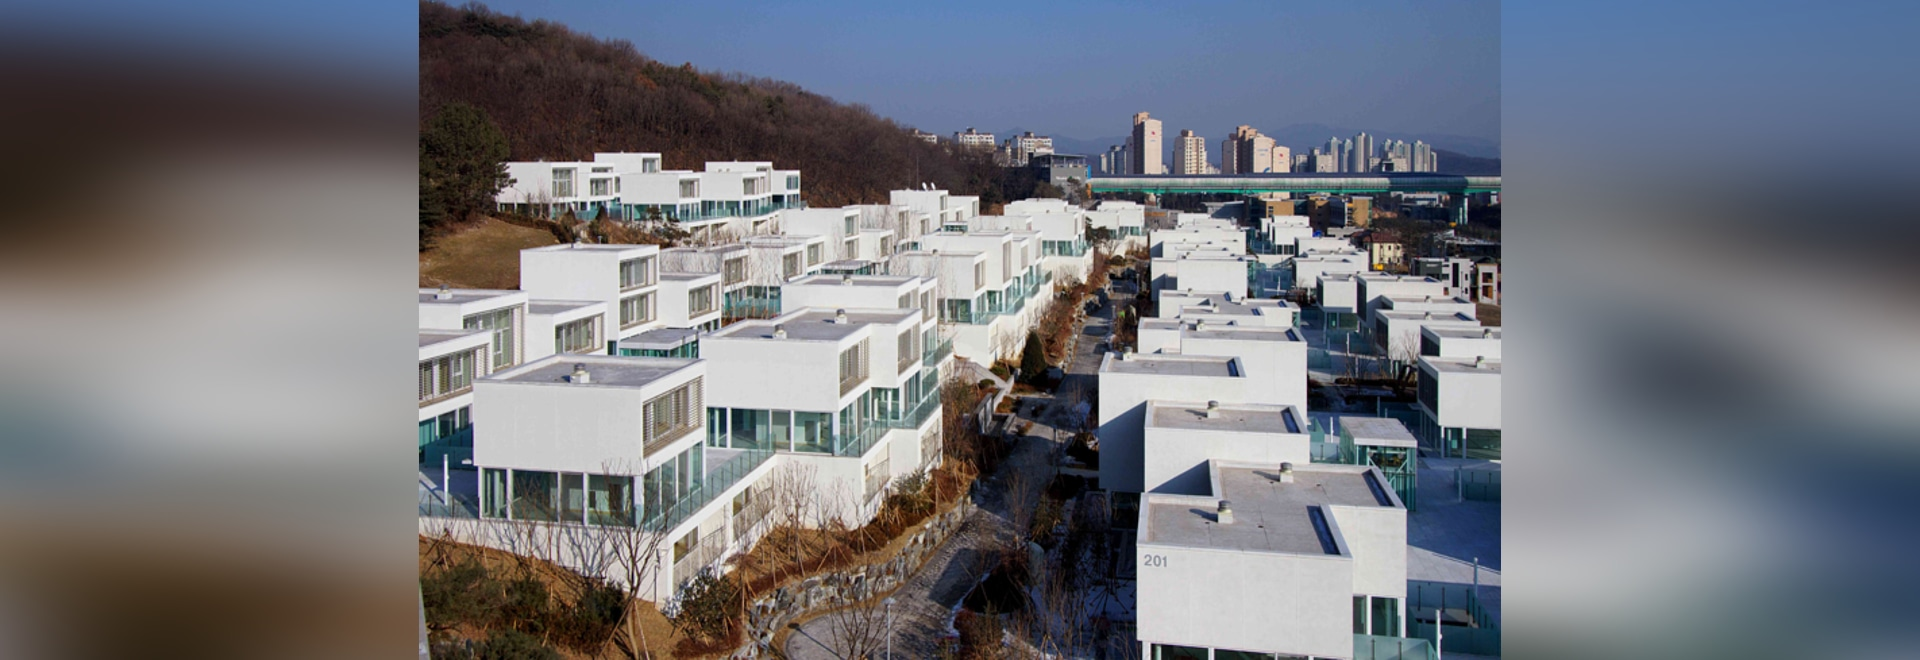 Pangyo Gehäuse - Seongnam-si, Gyeonggi-do, South Korea